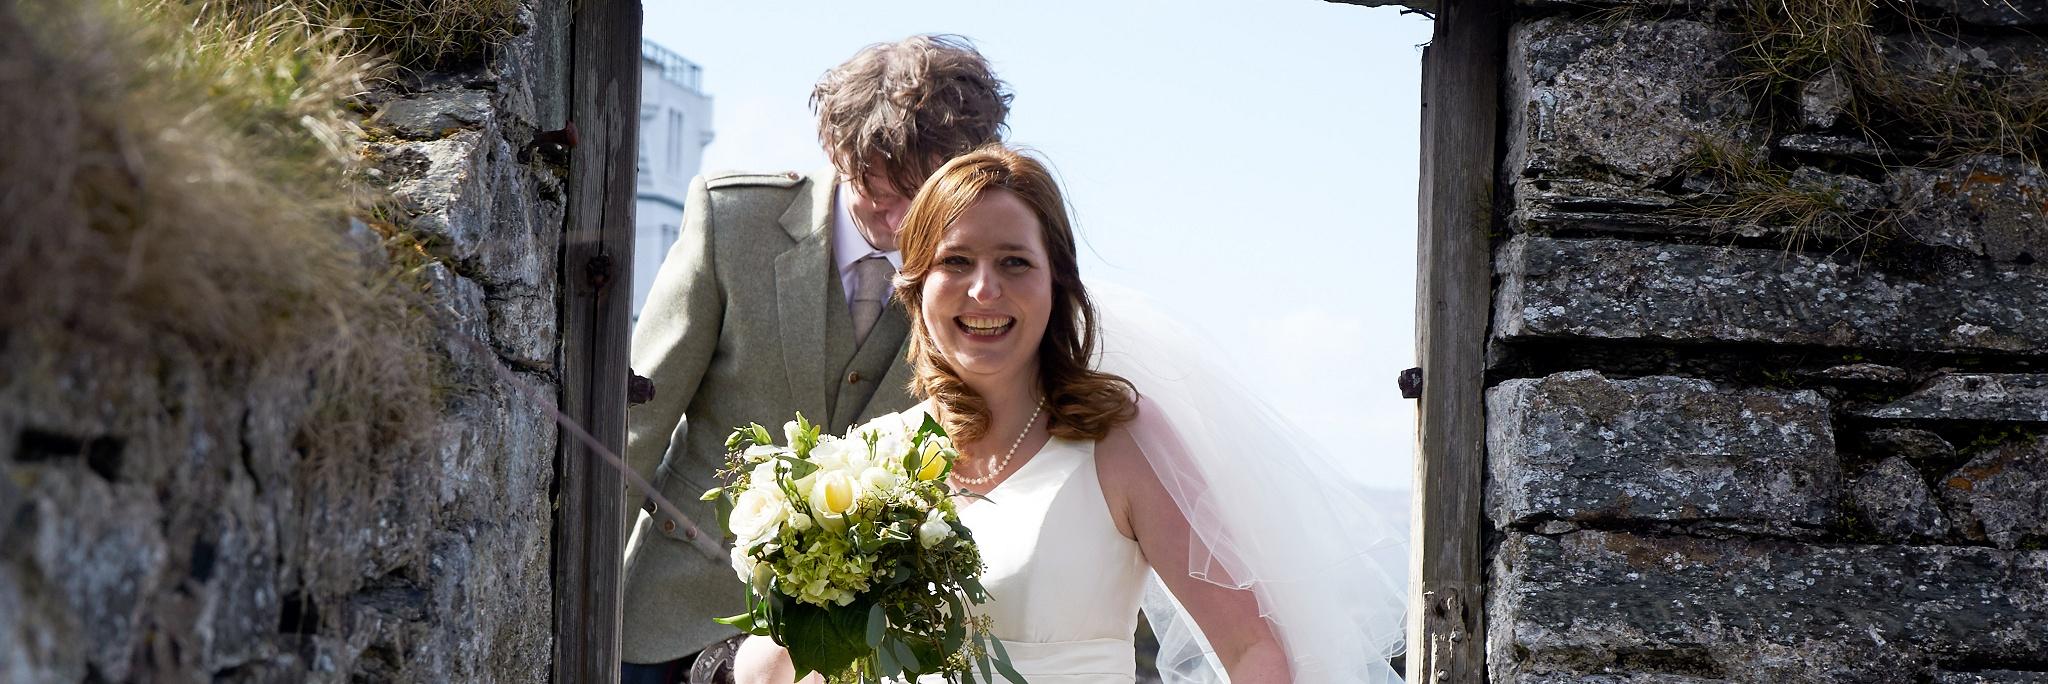 Wedding Header Jpg